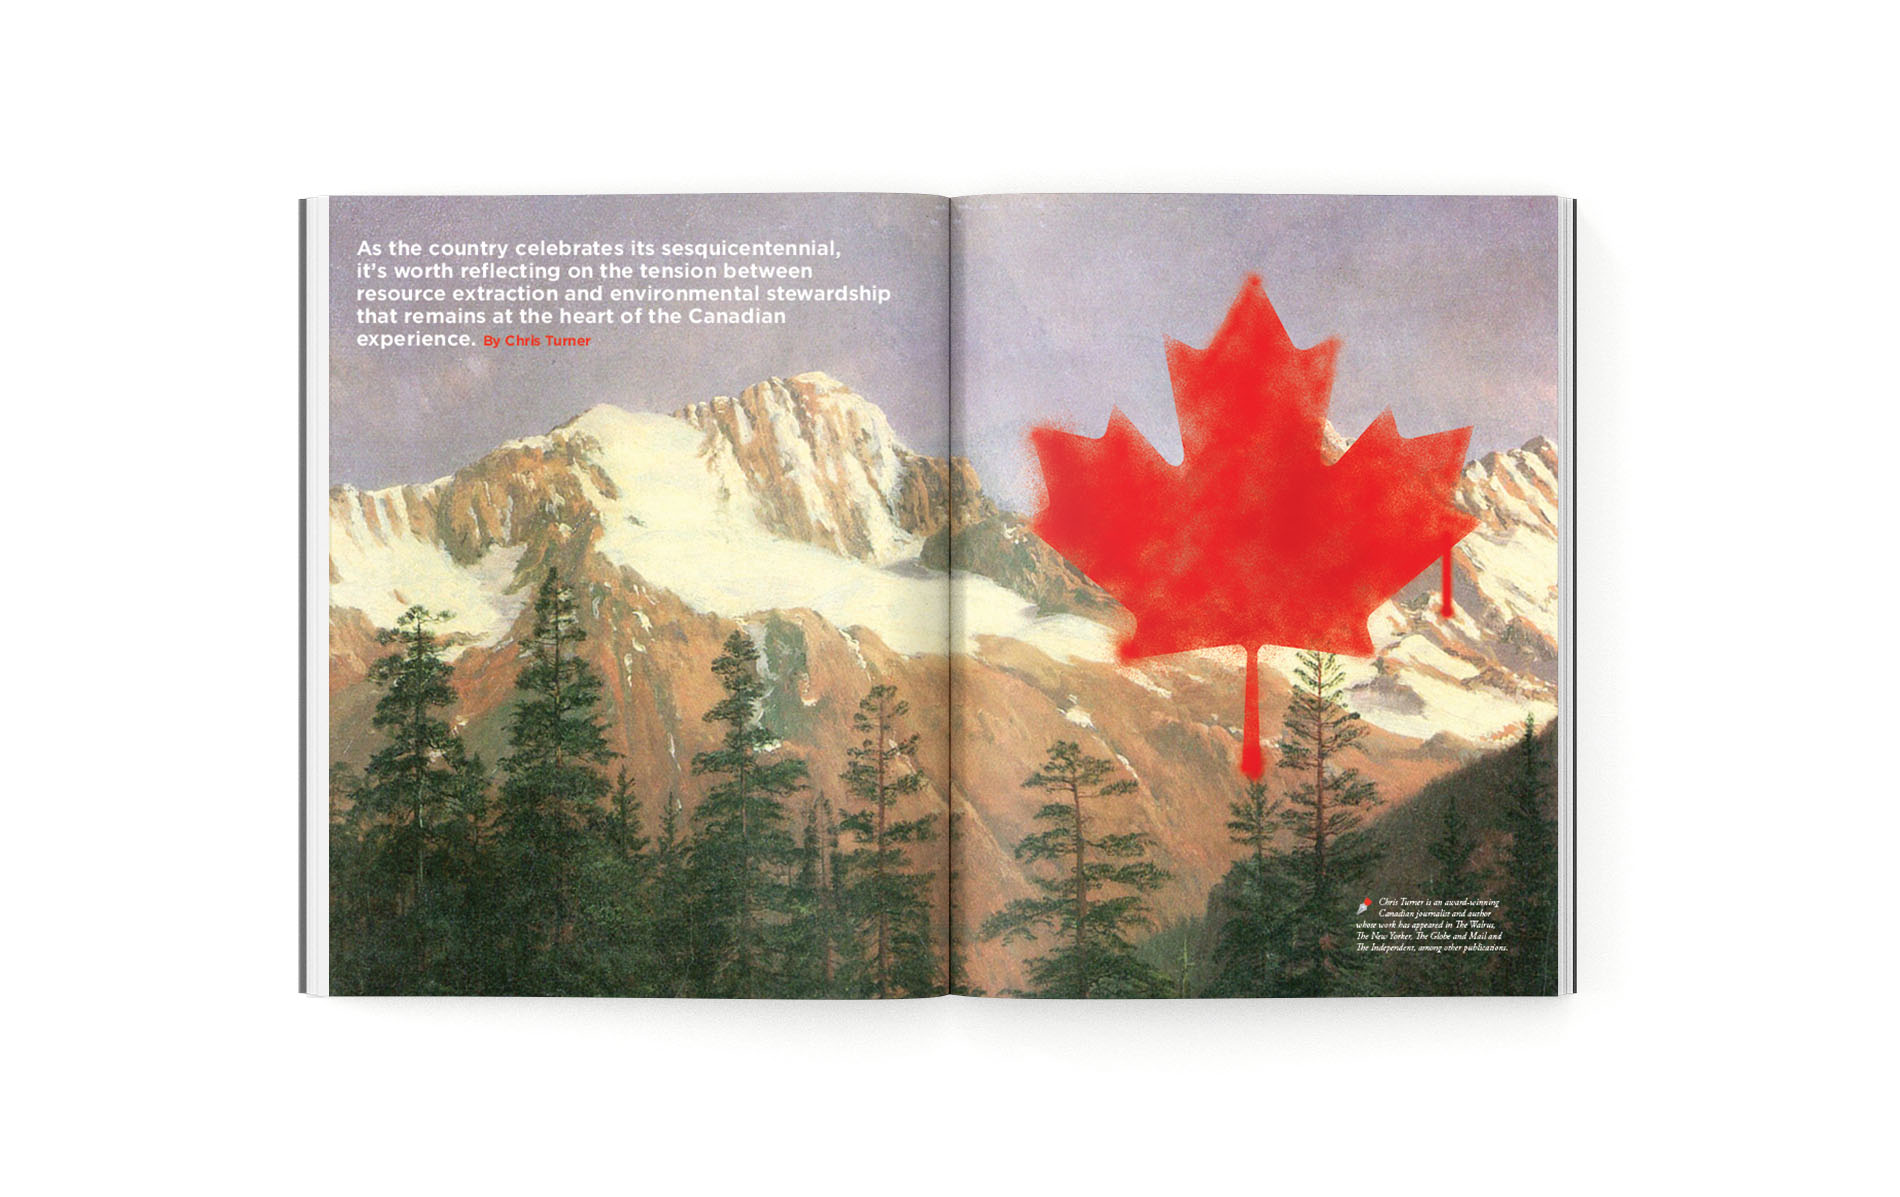 MEOW_layout_CK_Canada150.jpg